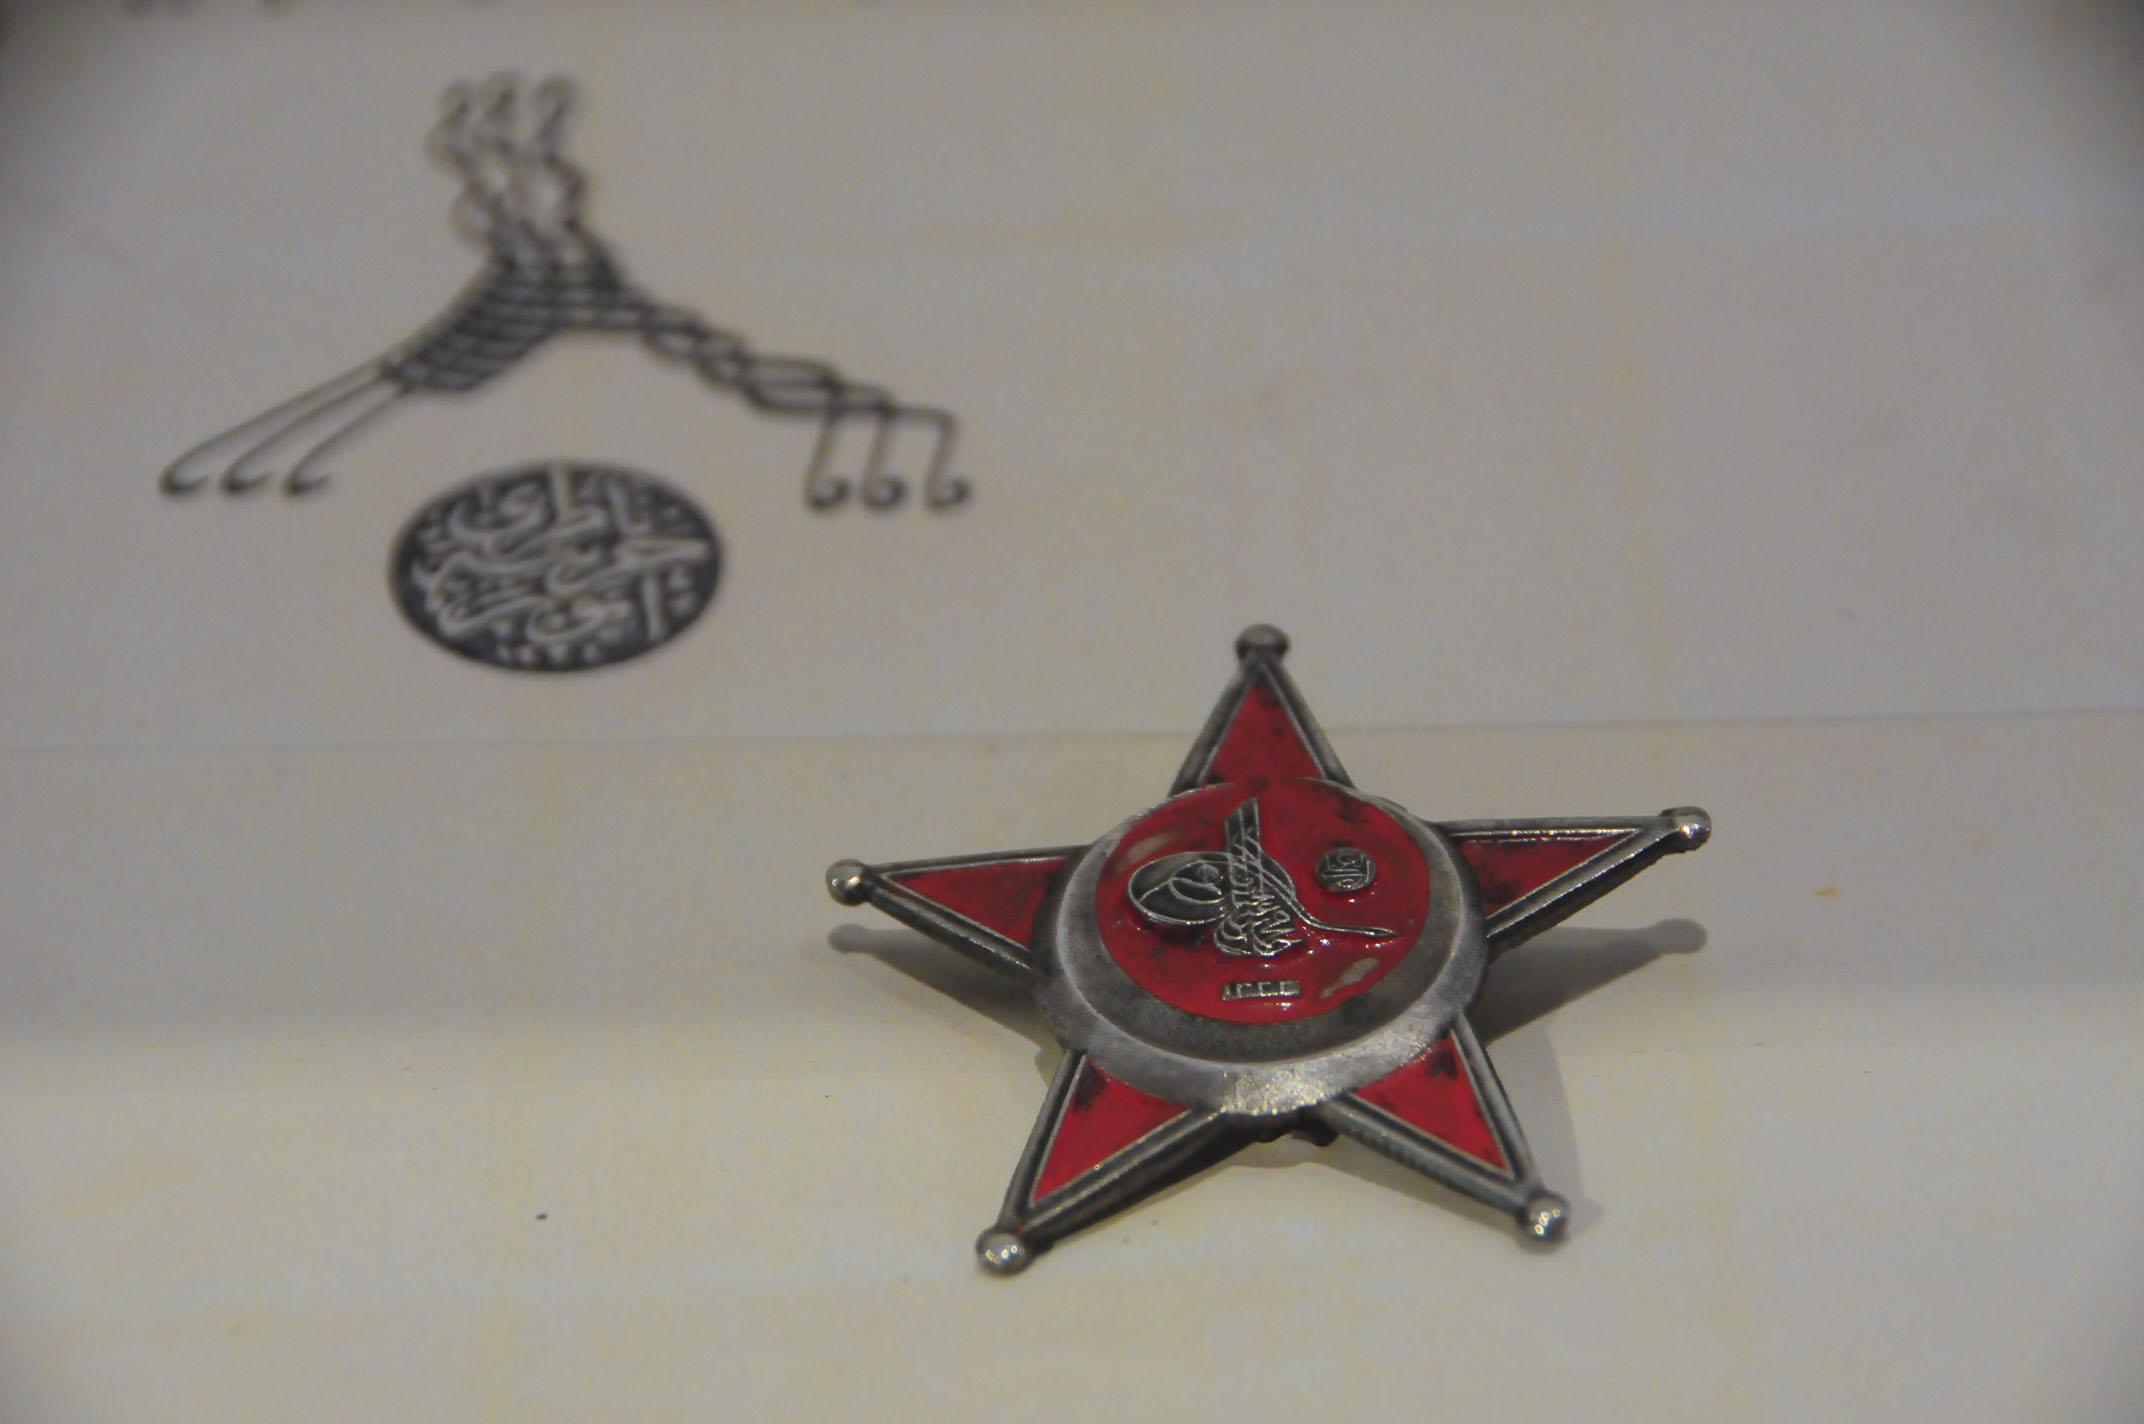 troyan-museum-hydovnikat-roden-za-razboinik-5